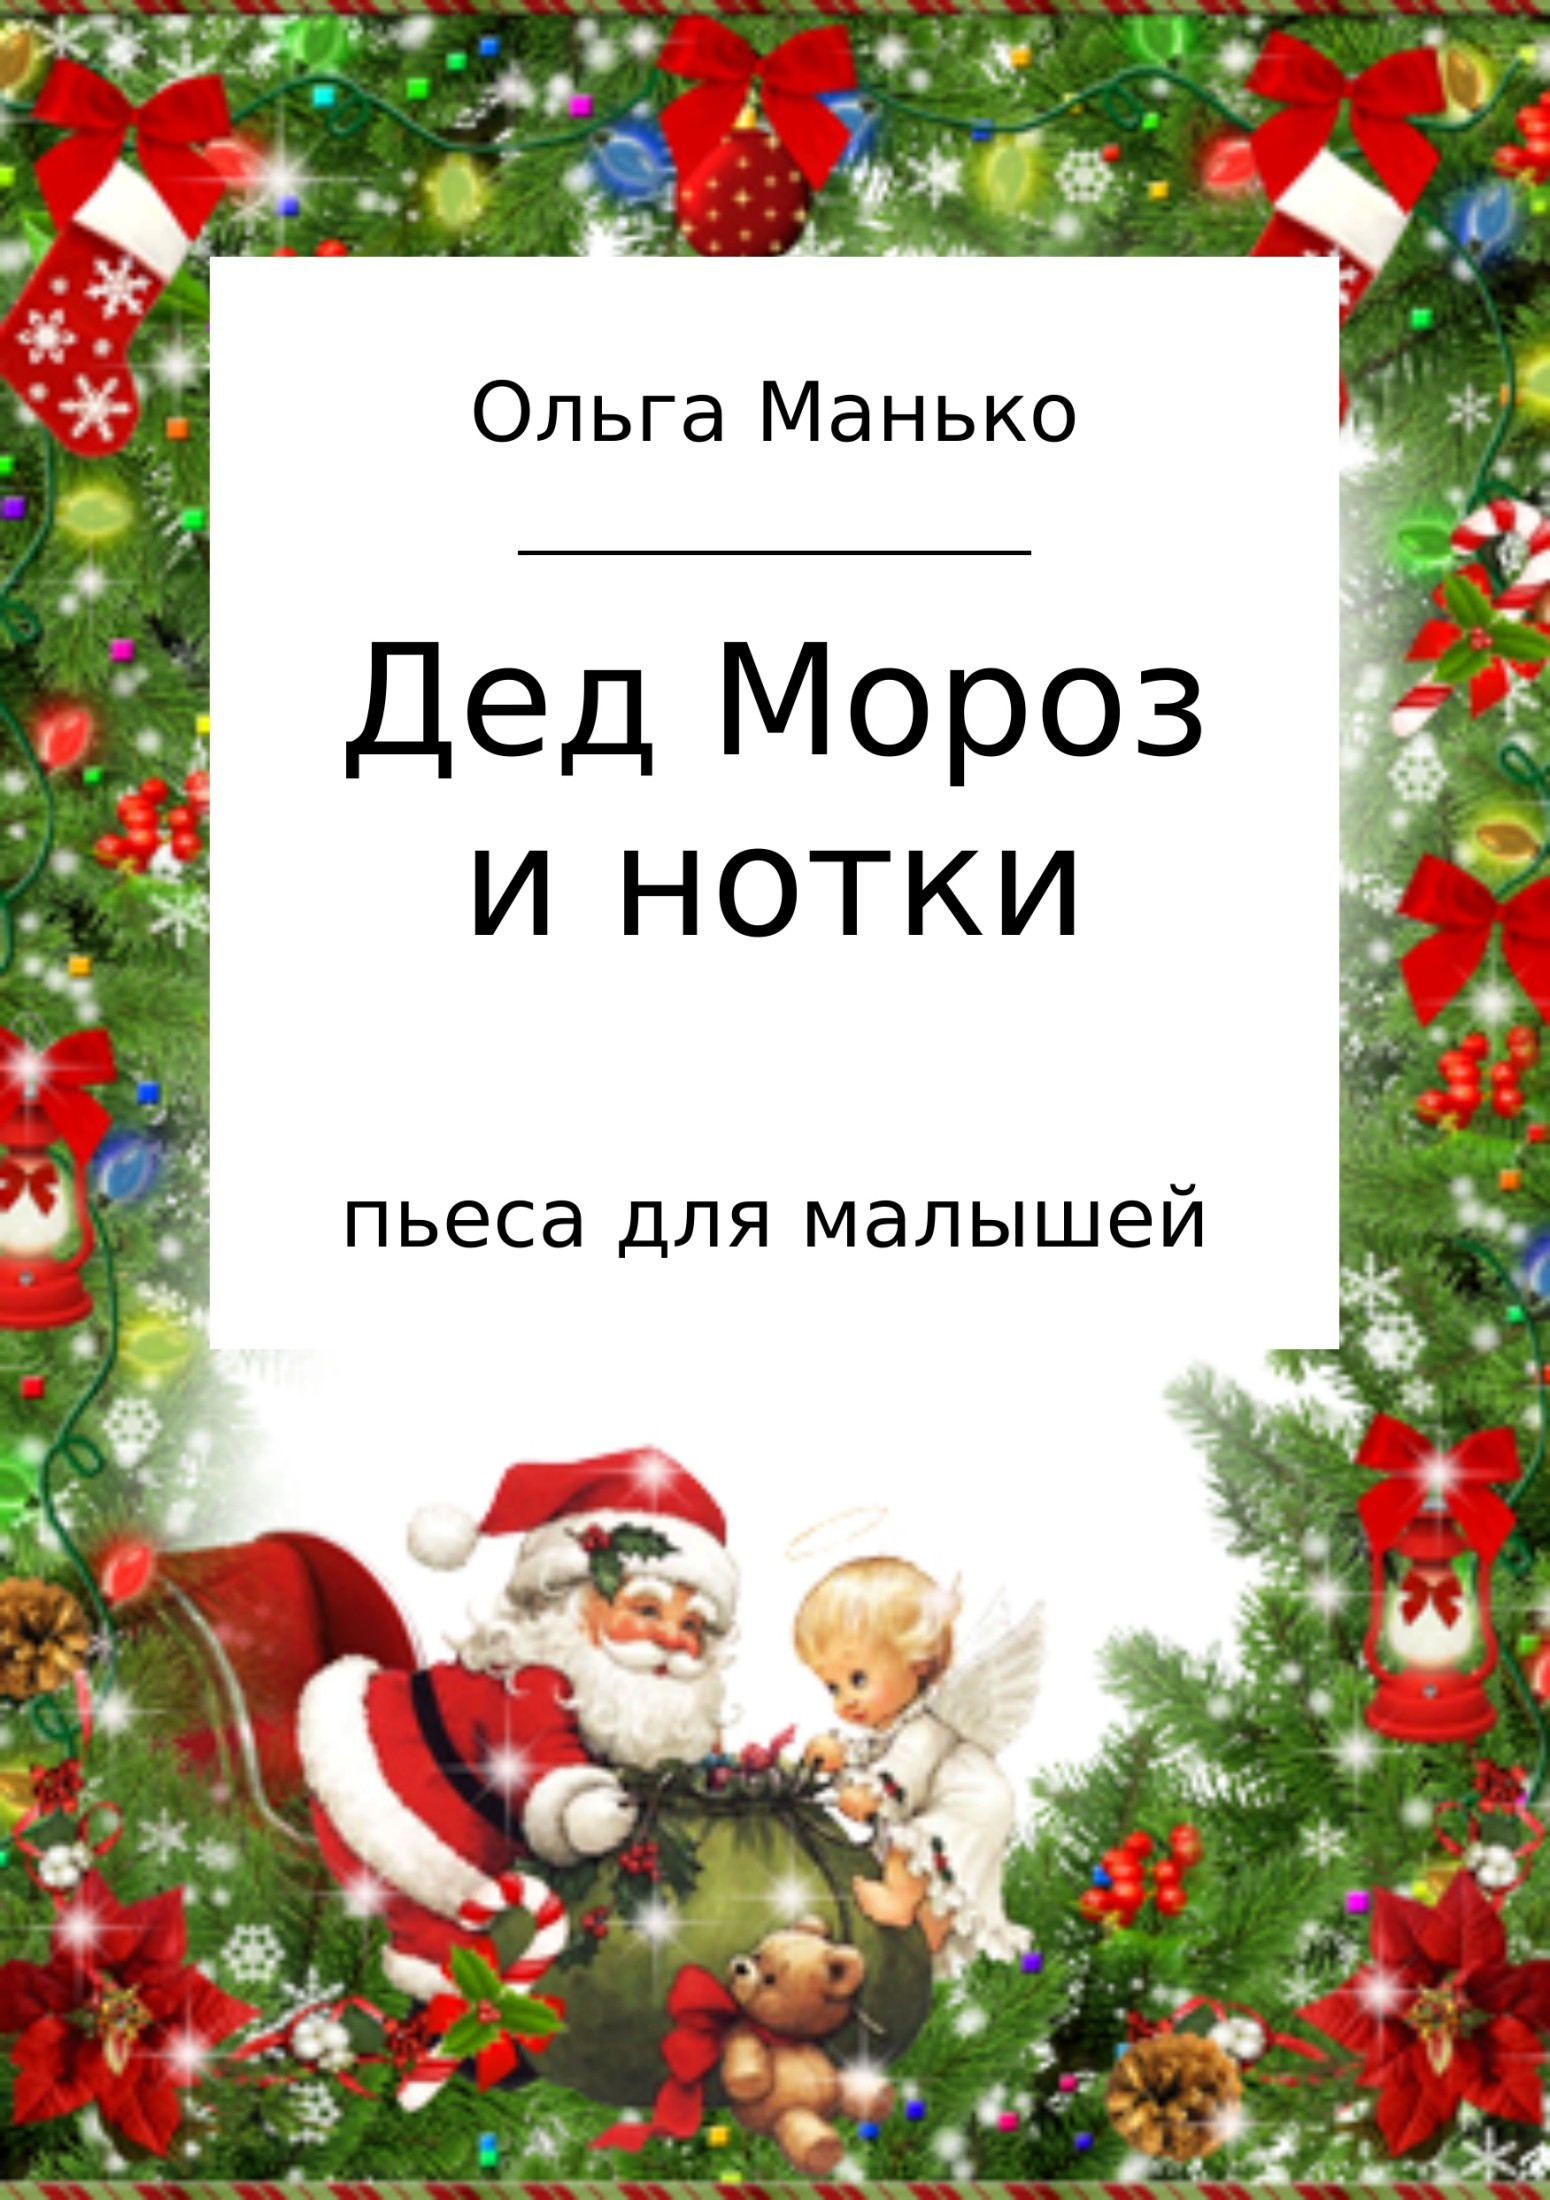 Ольга Манько - Дед Мороз и нотки